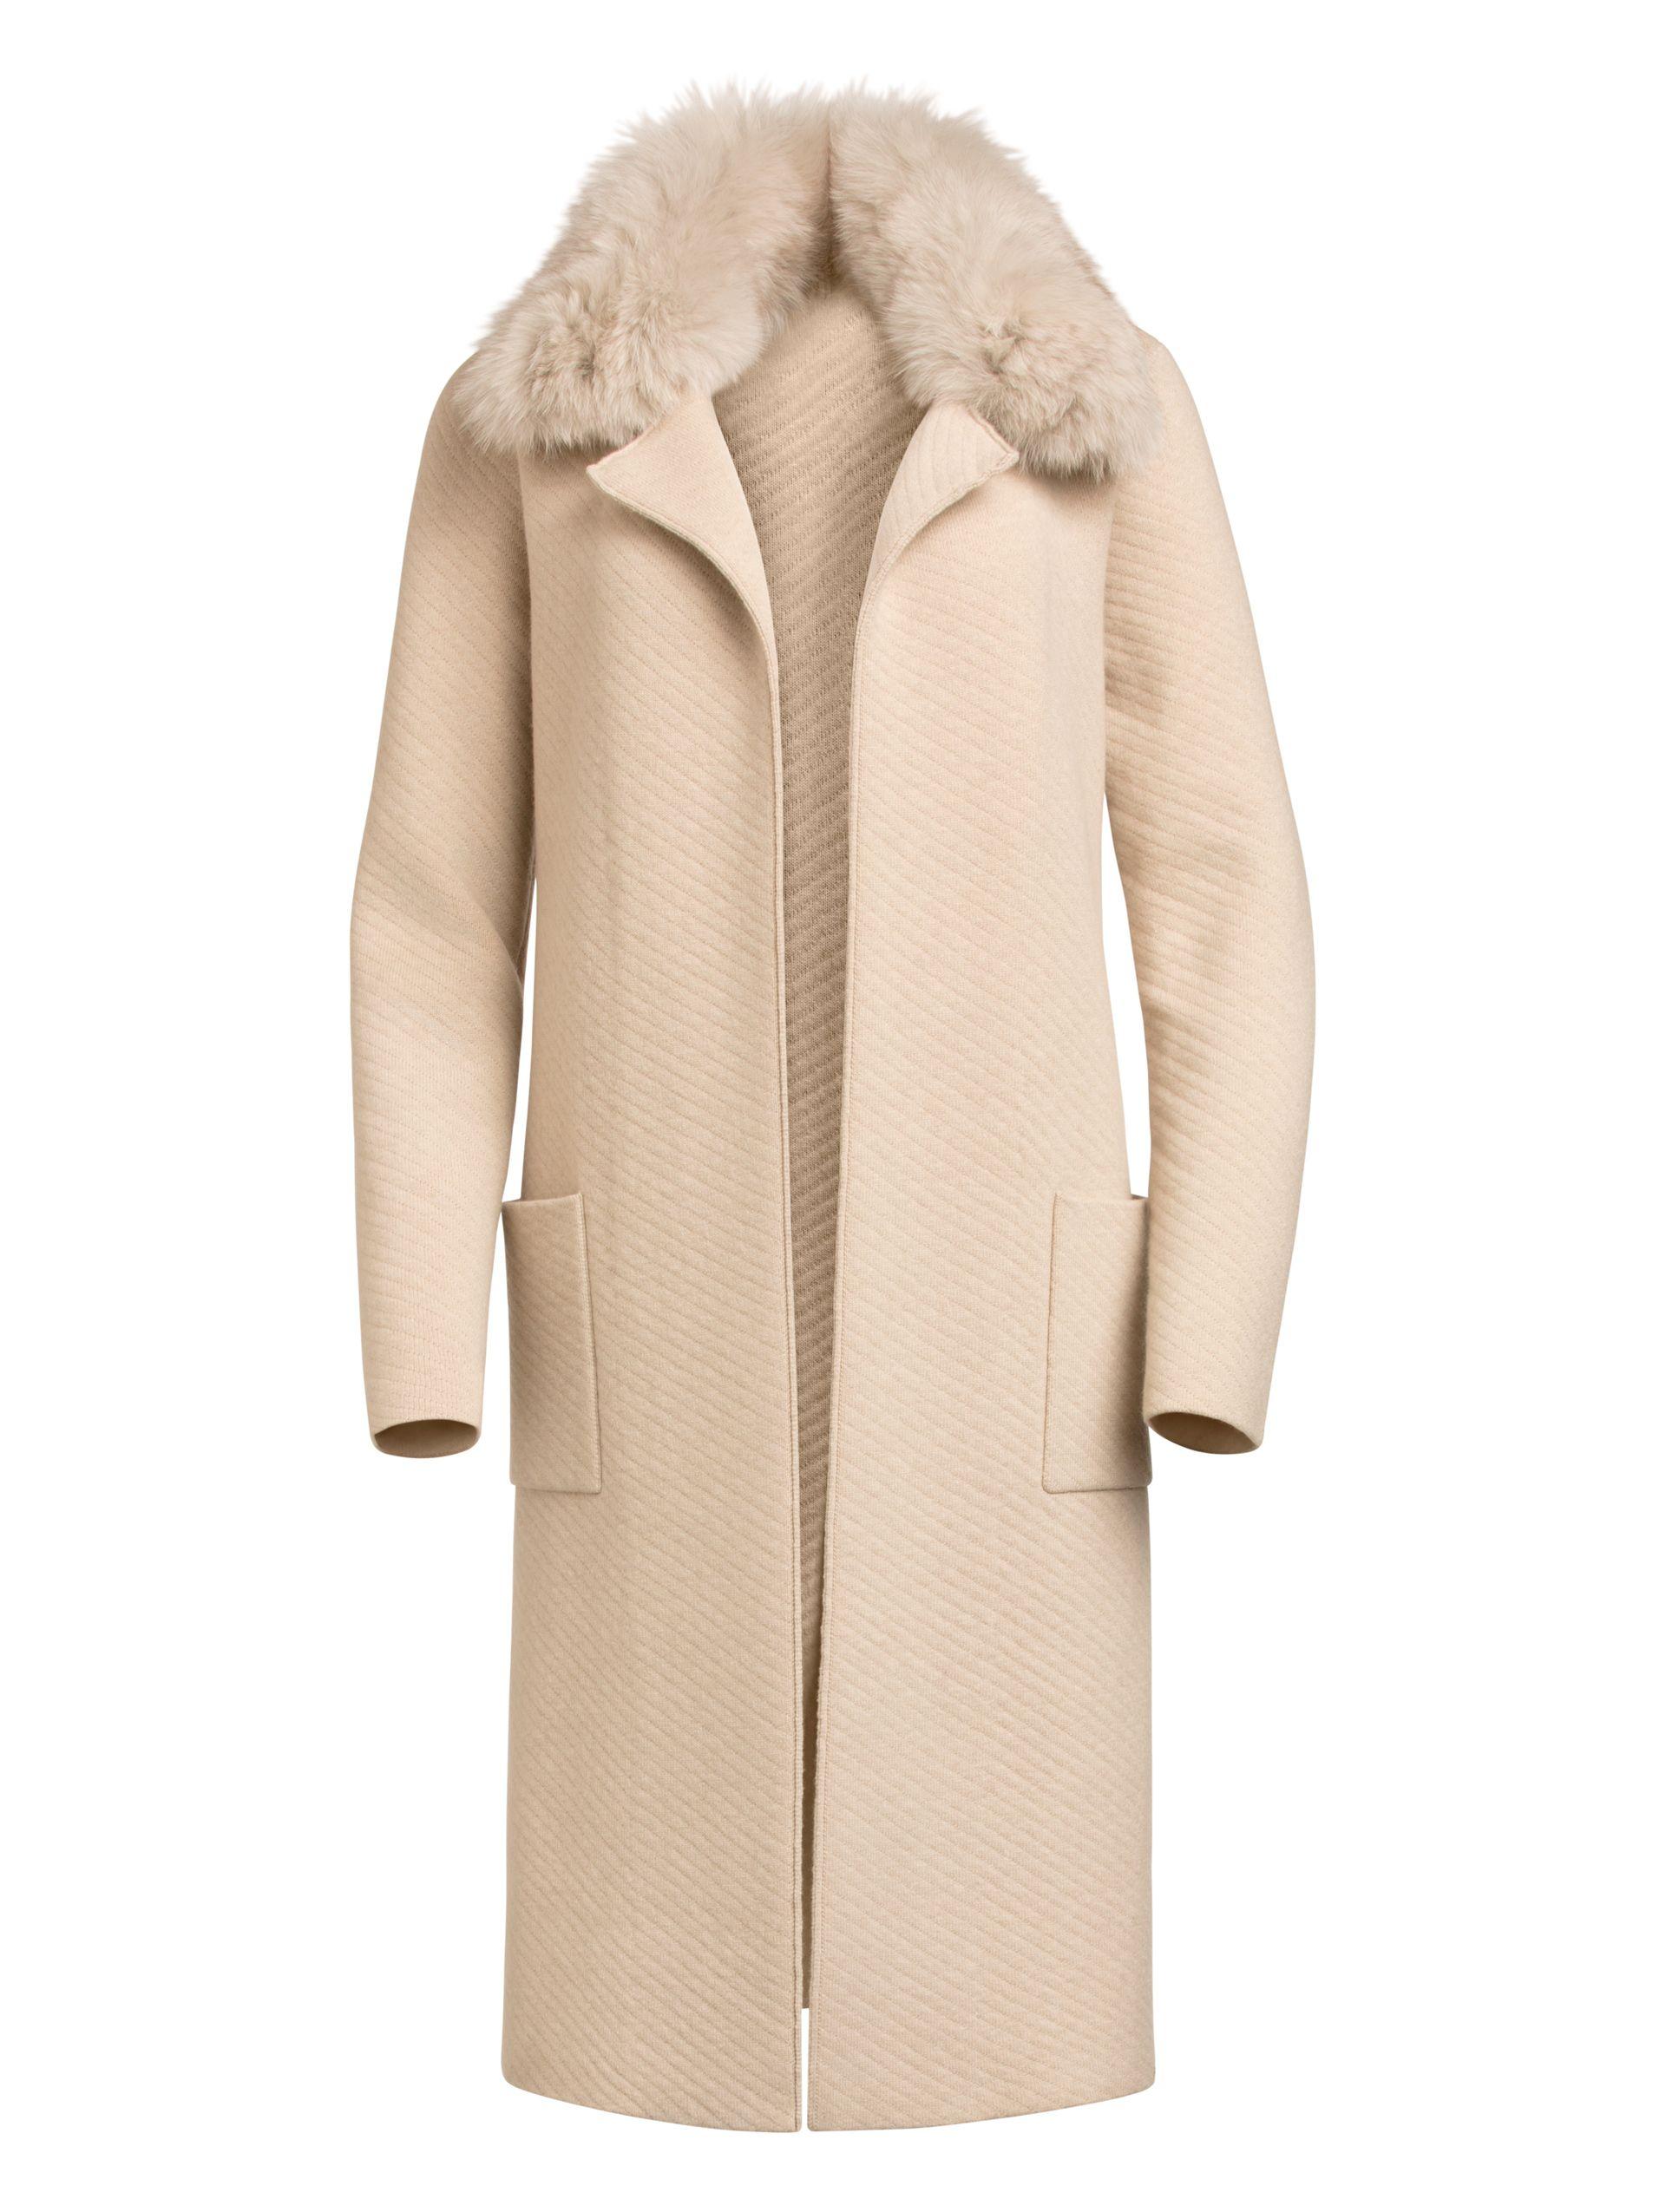 Saint John Quilted Twill Jacquard Knit Coat